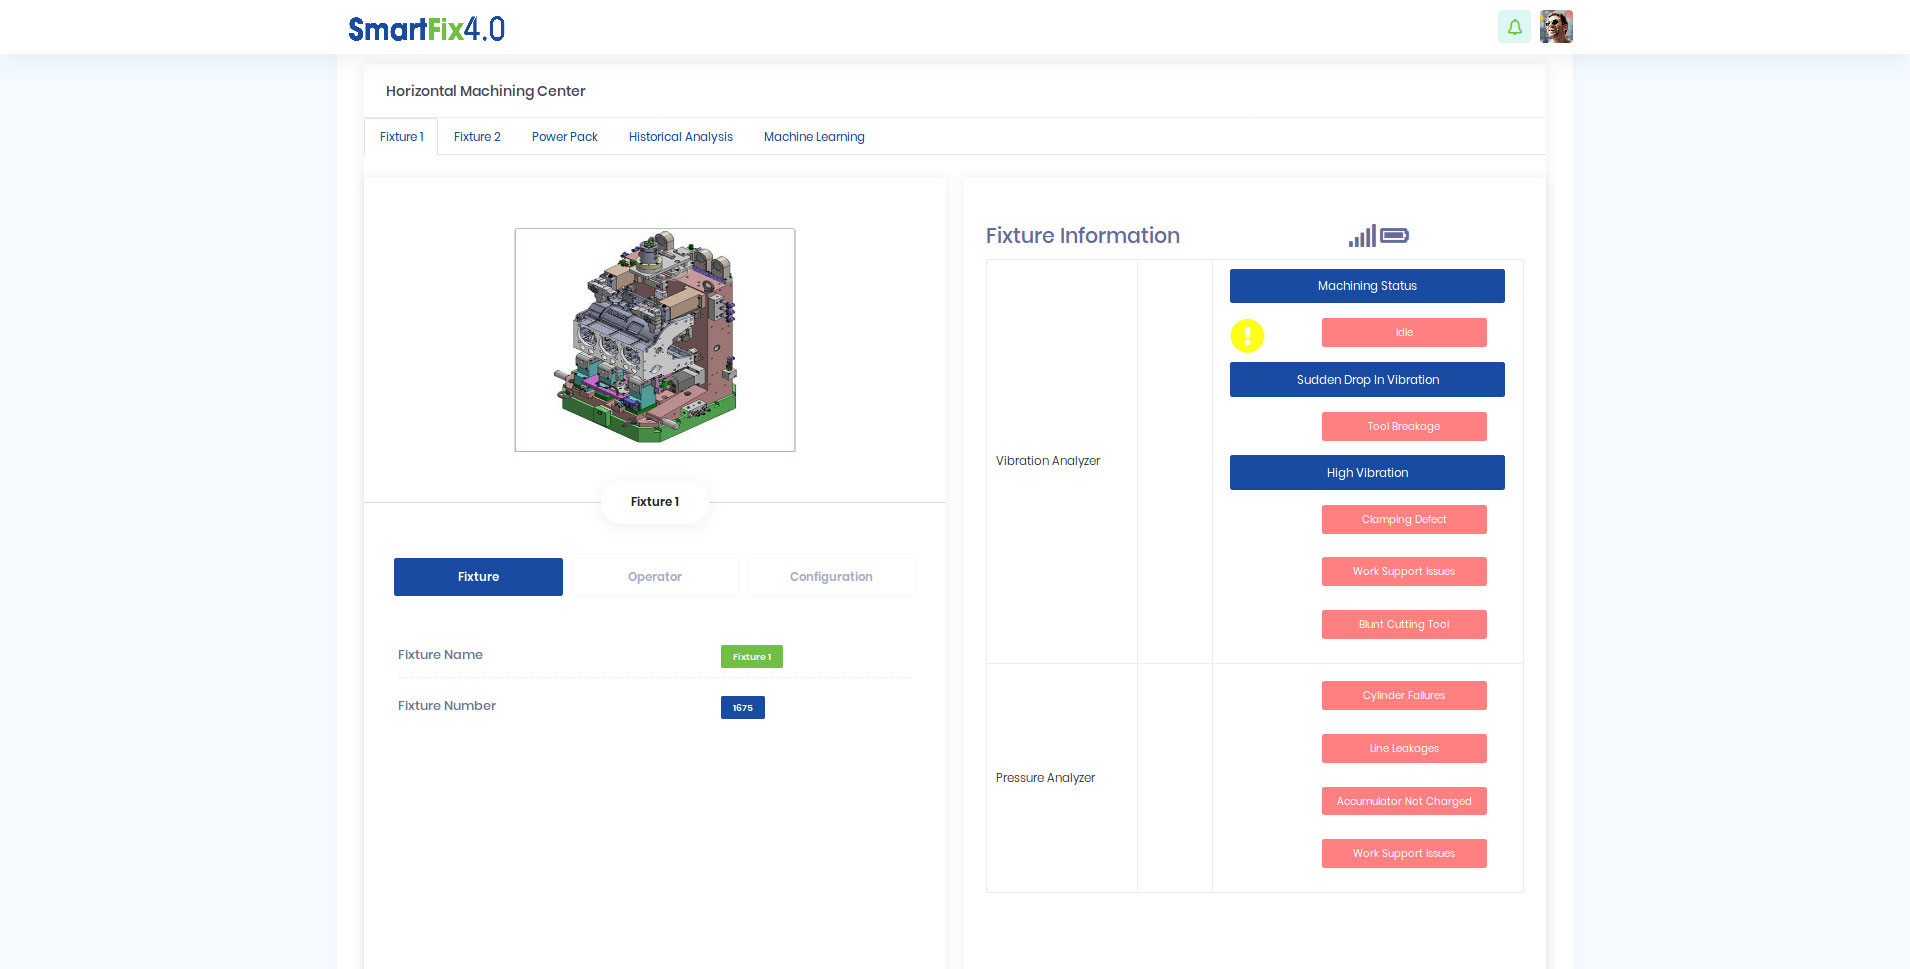 Sensor Values and Analysis